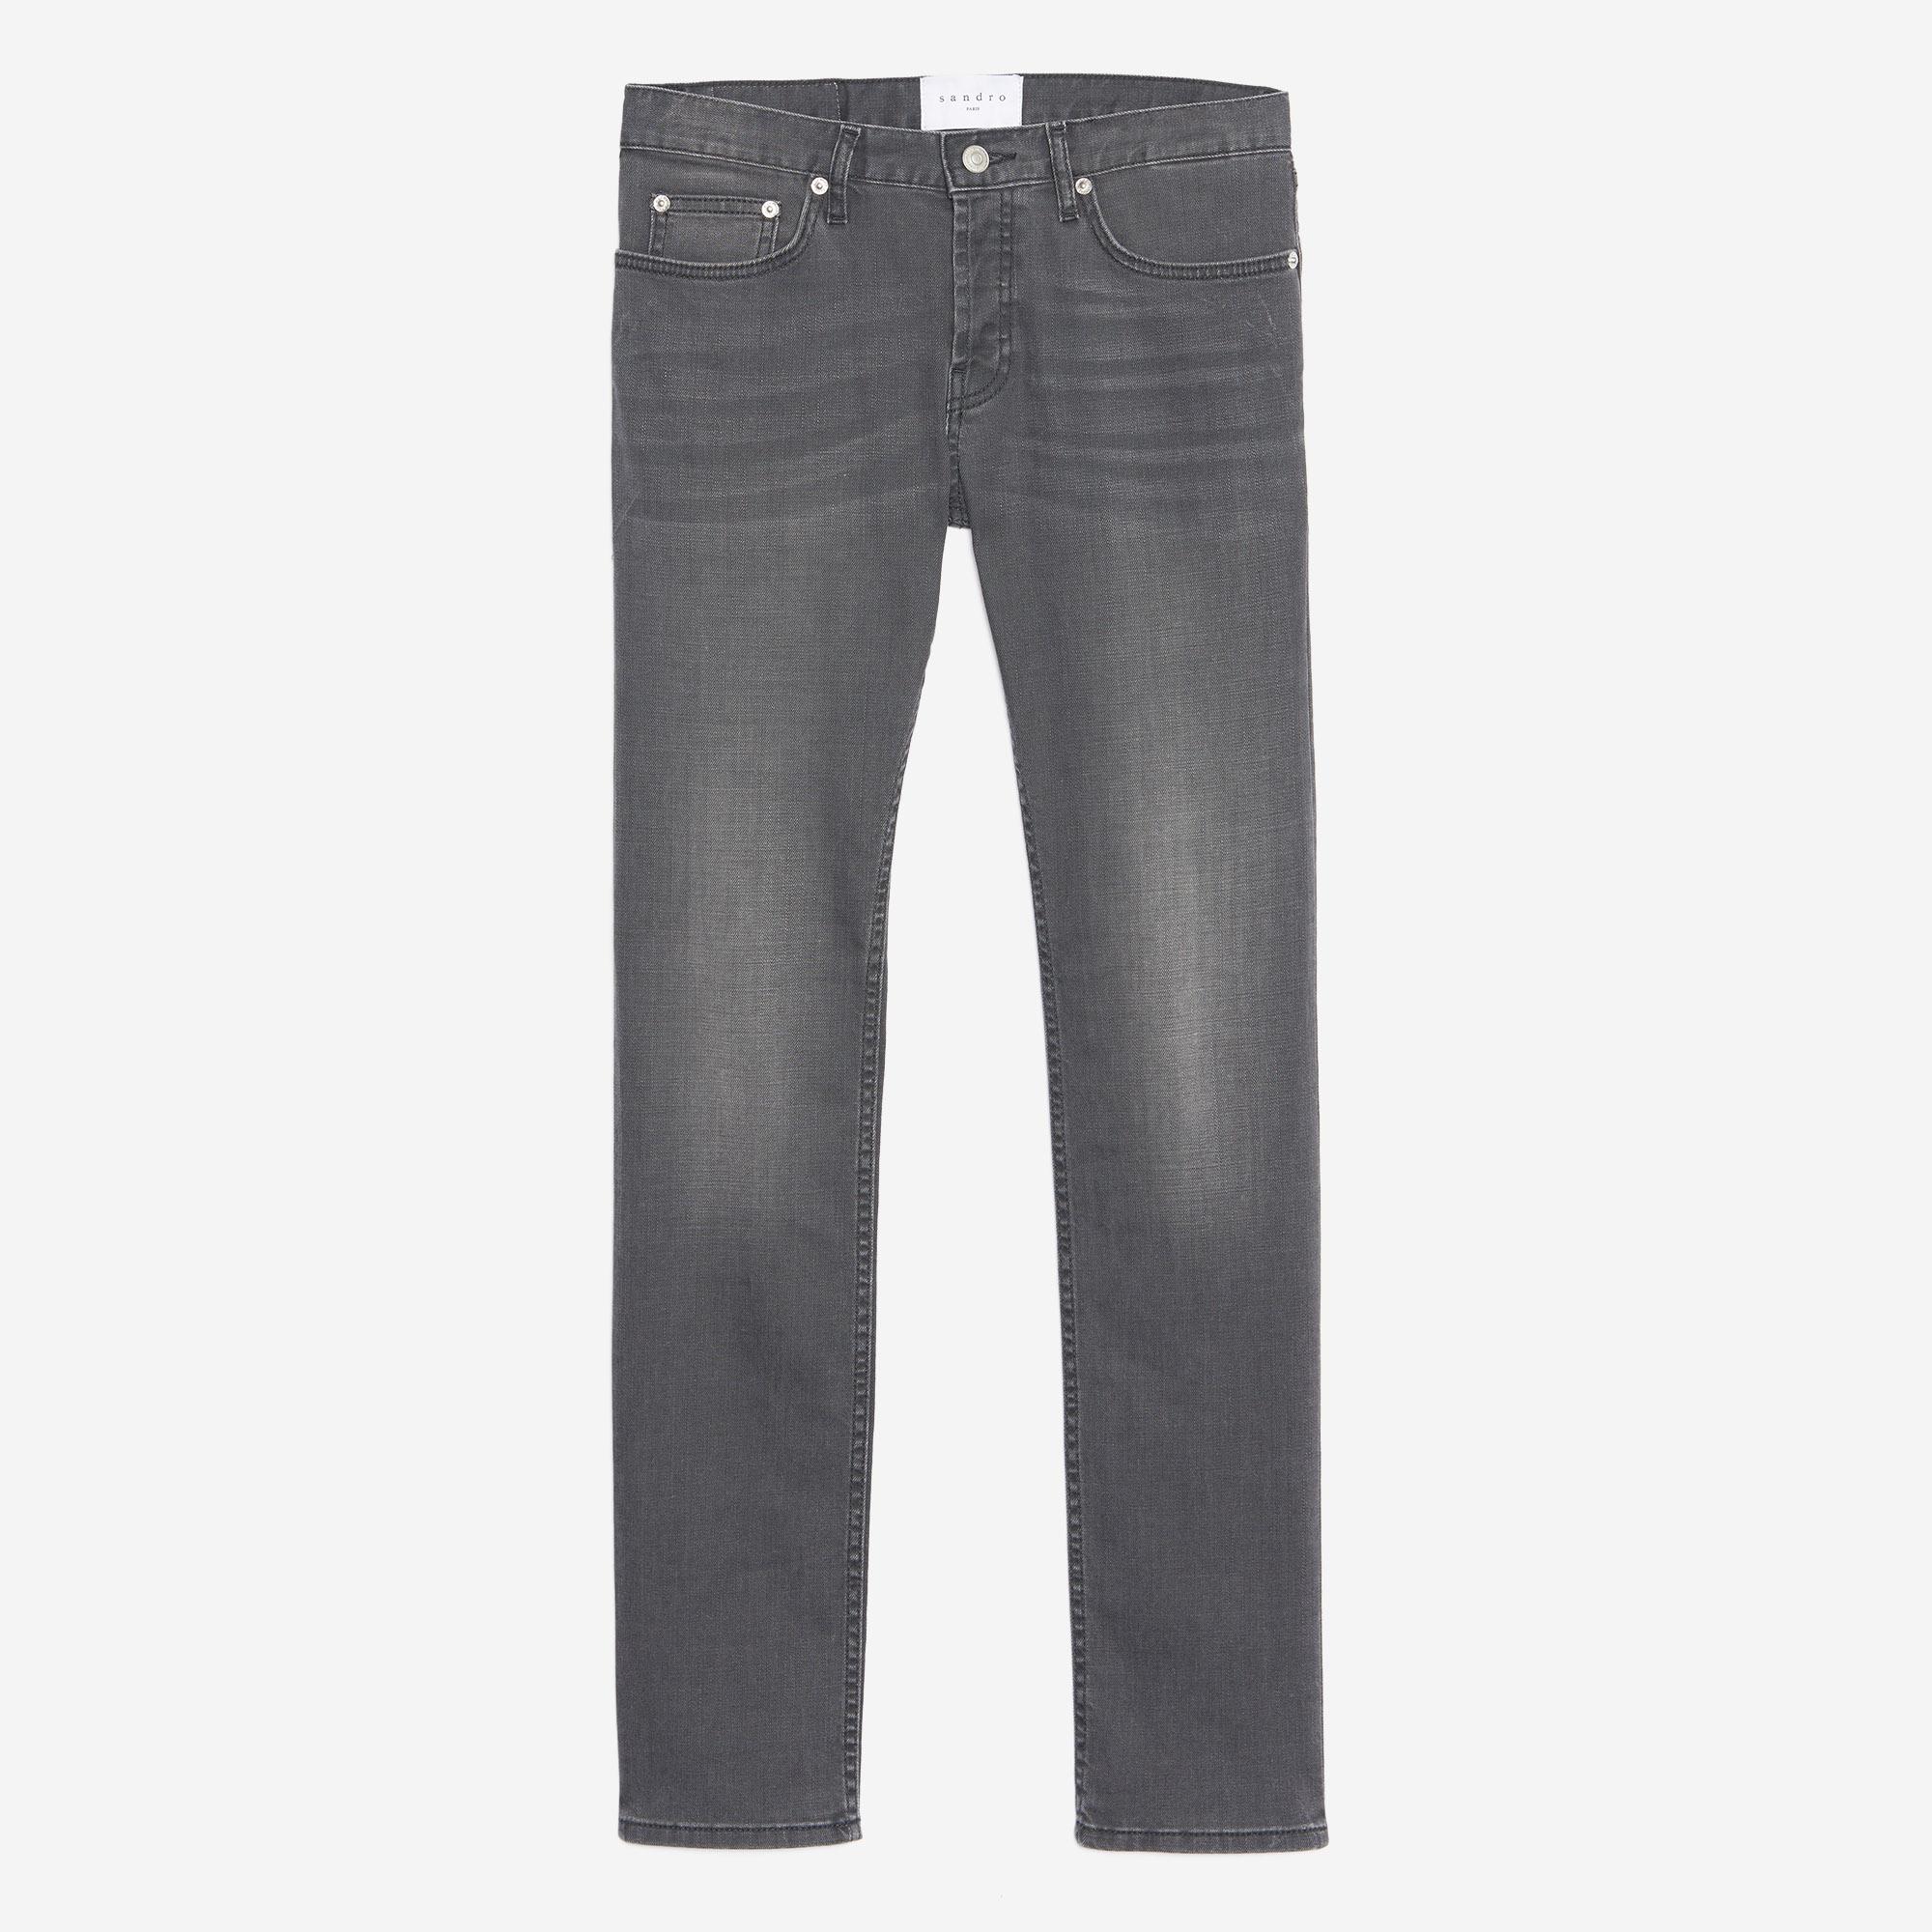 Jeans grey délavé - Slim : Collezione Estiva colore Grigio